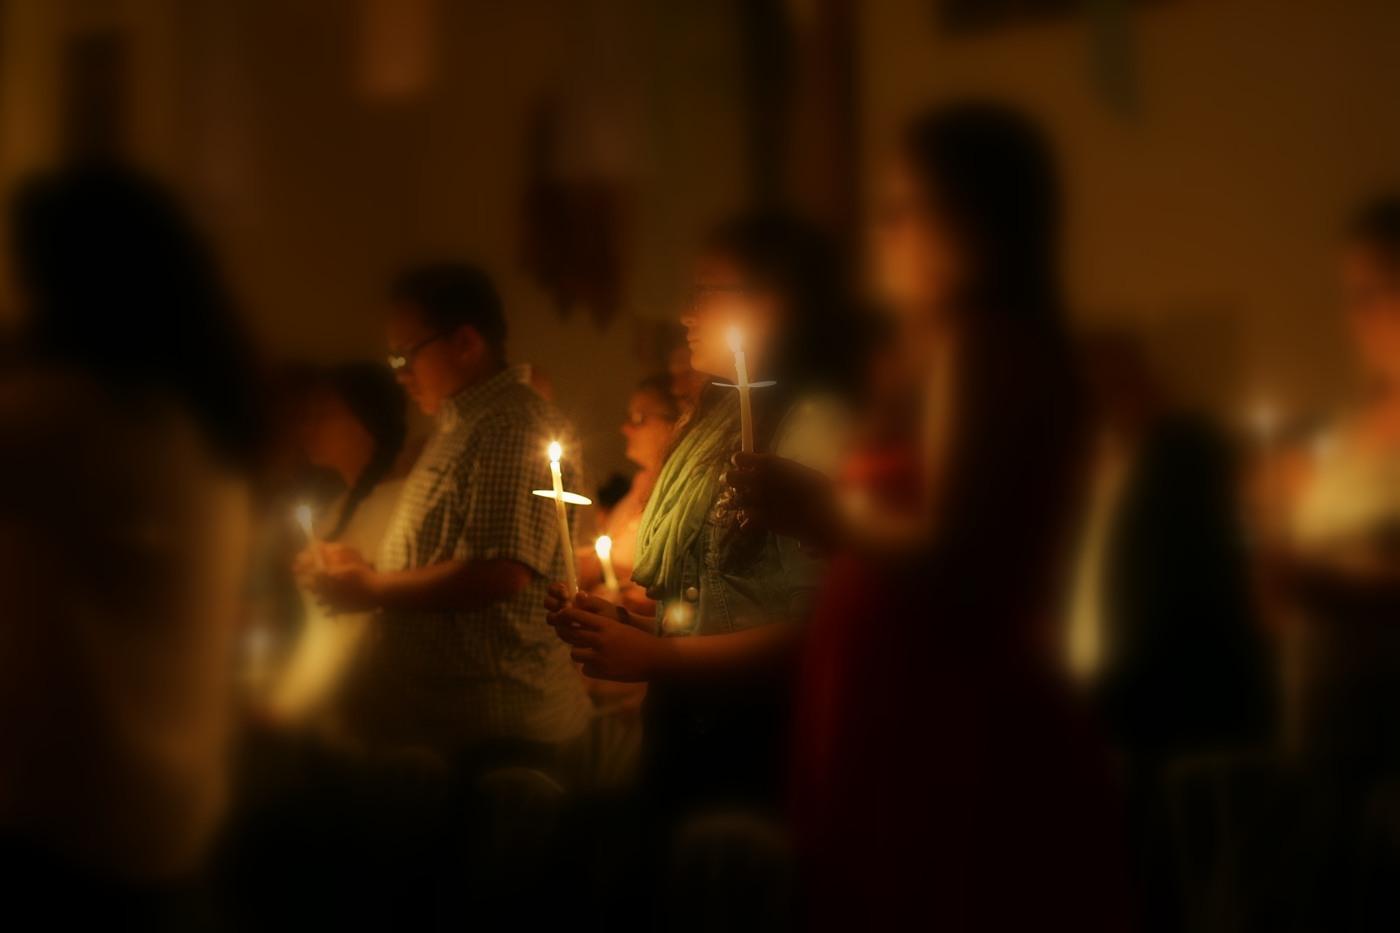 Silence. Hope. Holy Saturday.